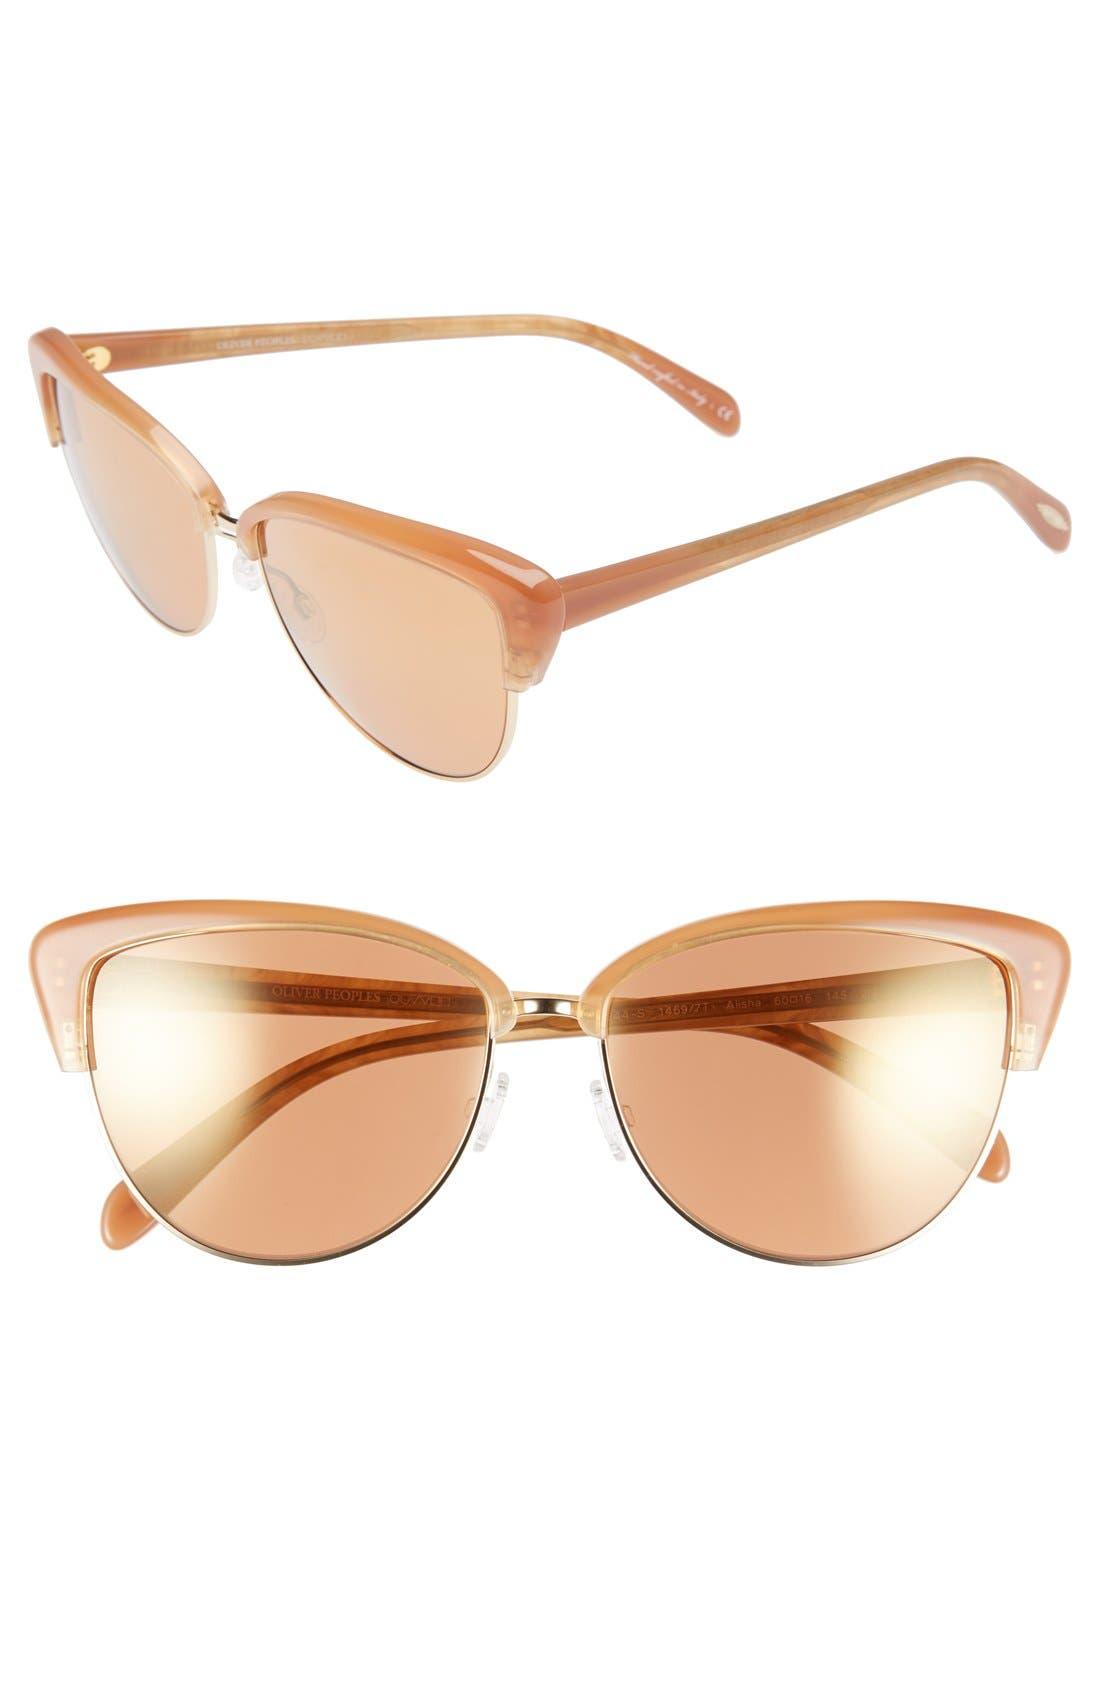 Main Image - Oliver Peoples 'Alisha' 60mm Sunglasses